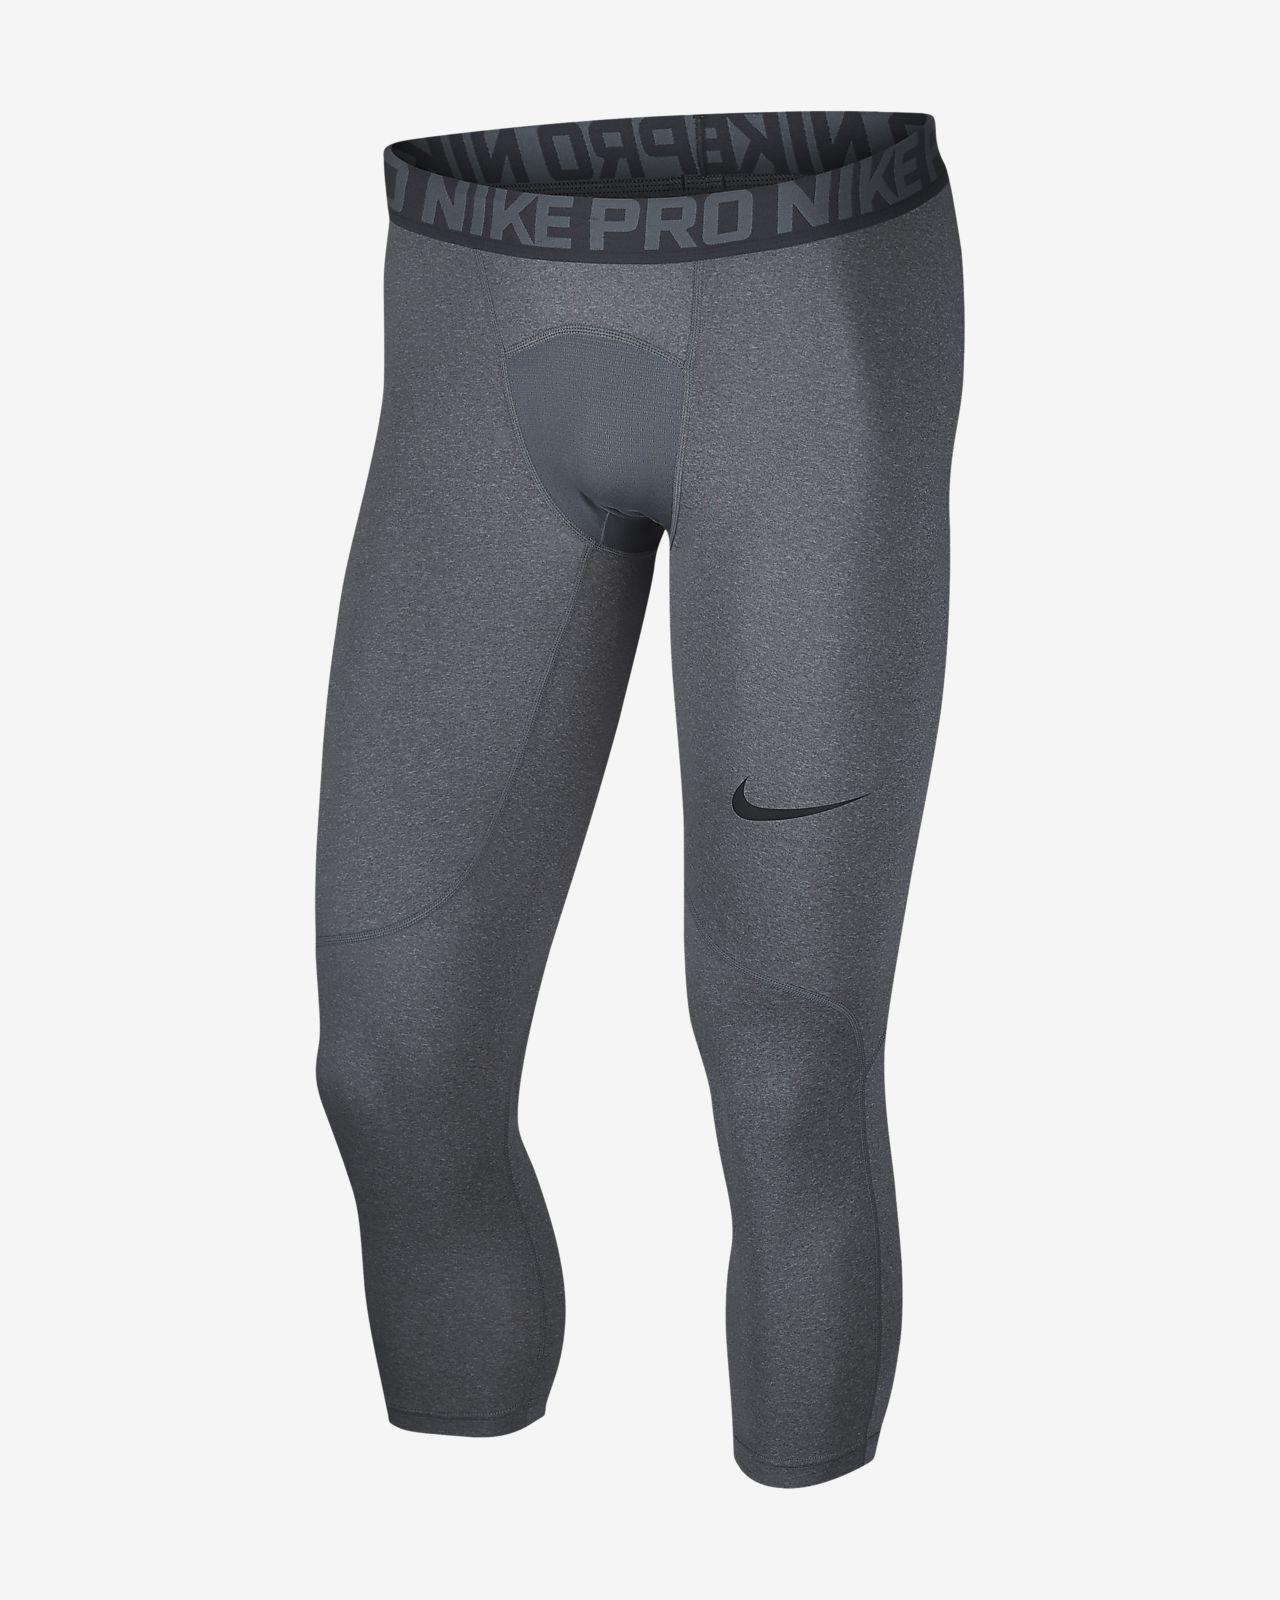 Nike Pro Men's 3/4 Training Tights